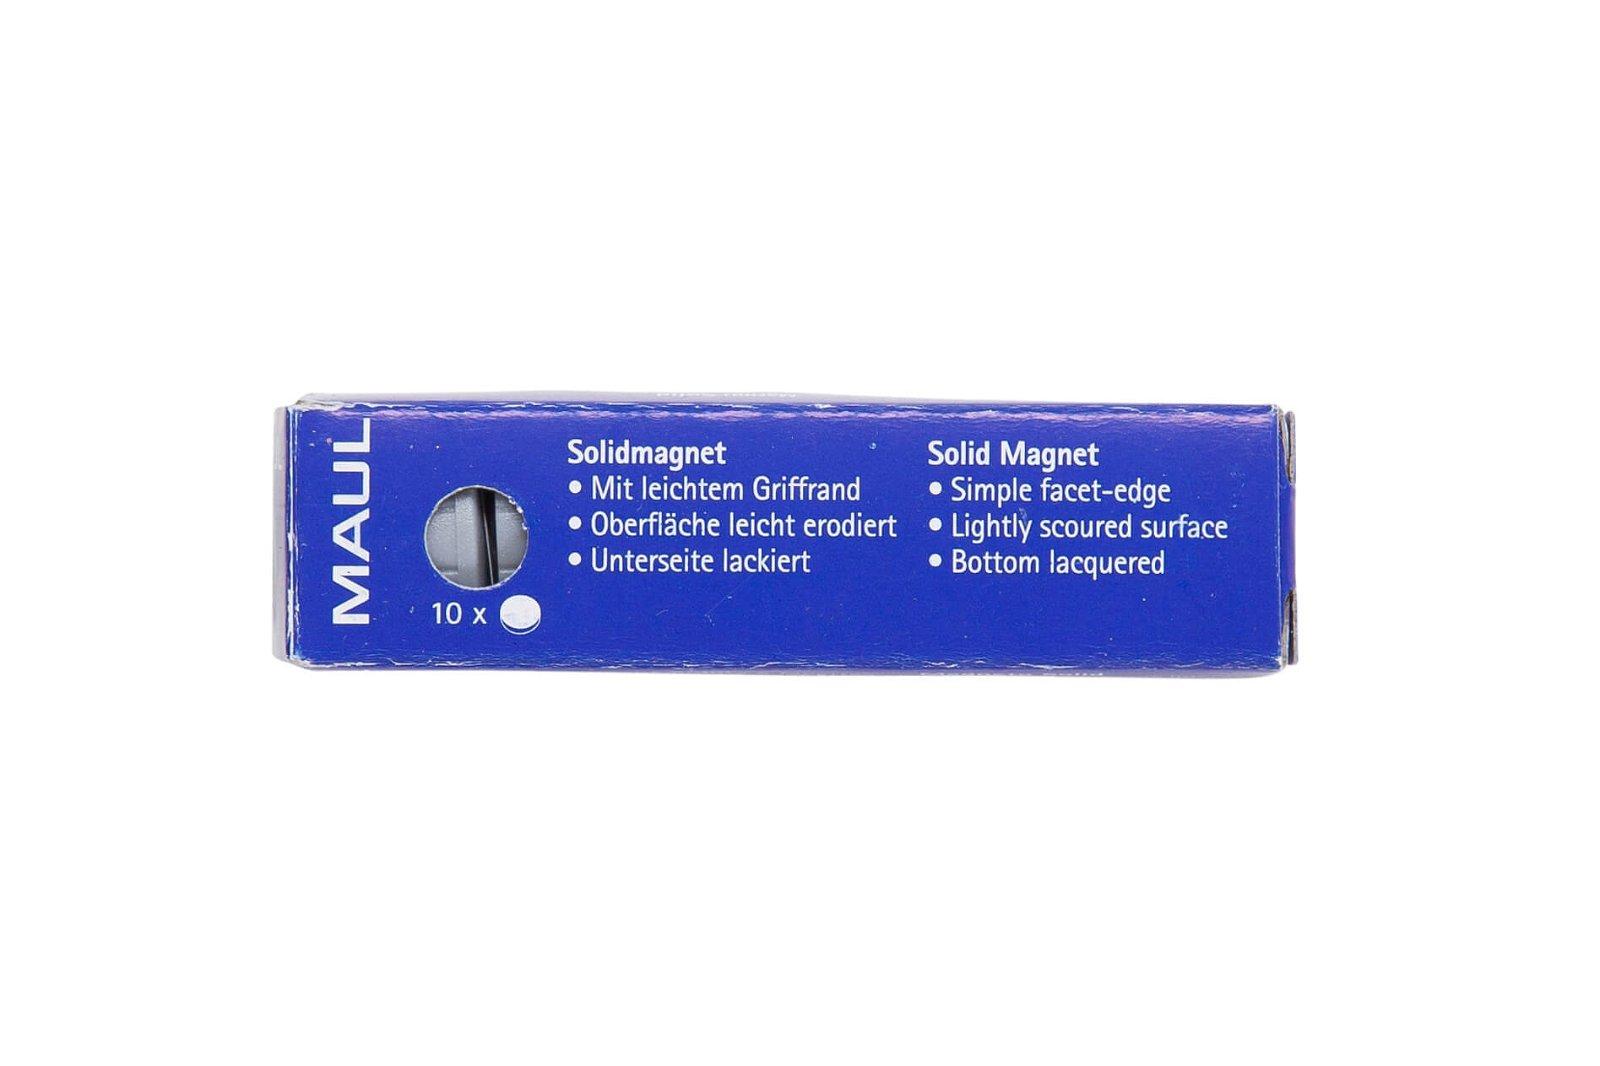 Magnet MAULsolid Ø 20 mm, 0,3 kg Haftkraft, 10 St./Ktn., grau